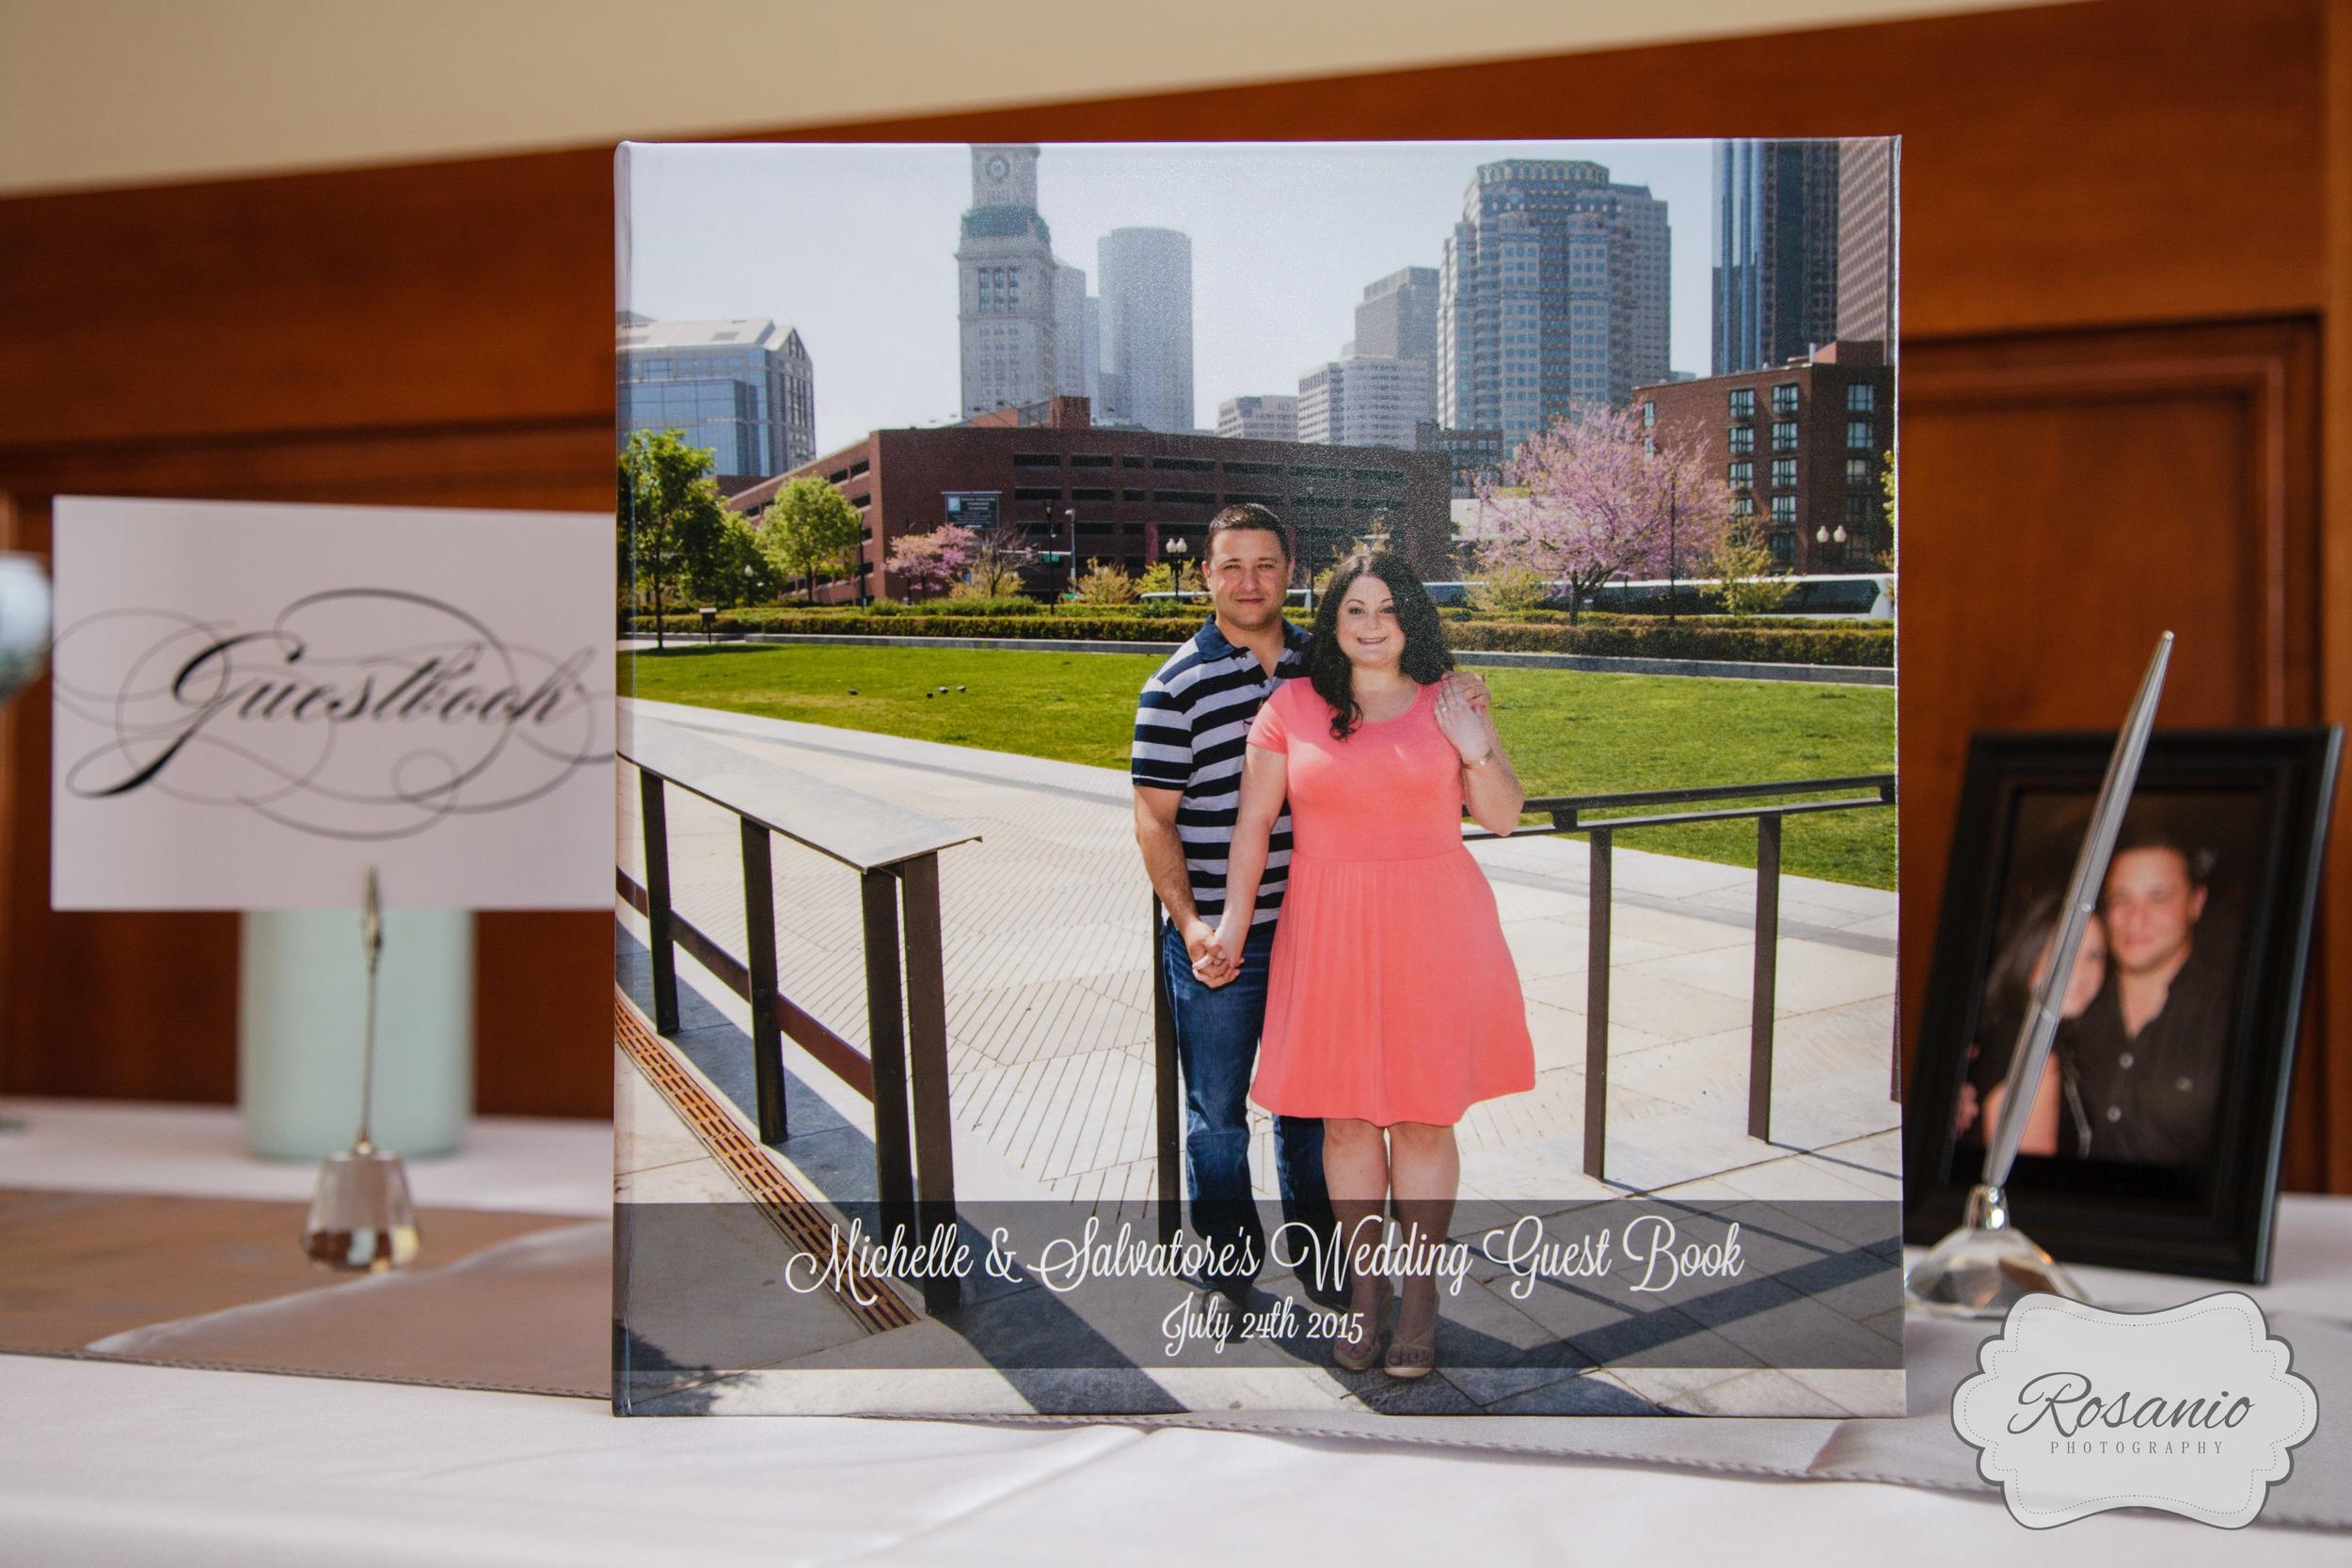 Rosanio Photography | Engagement Guest Book | Massachusetts Wedding Photographer